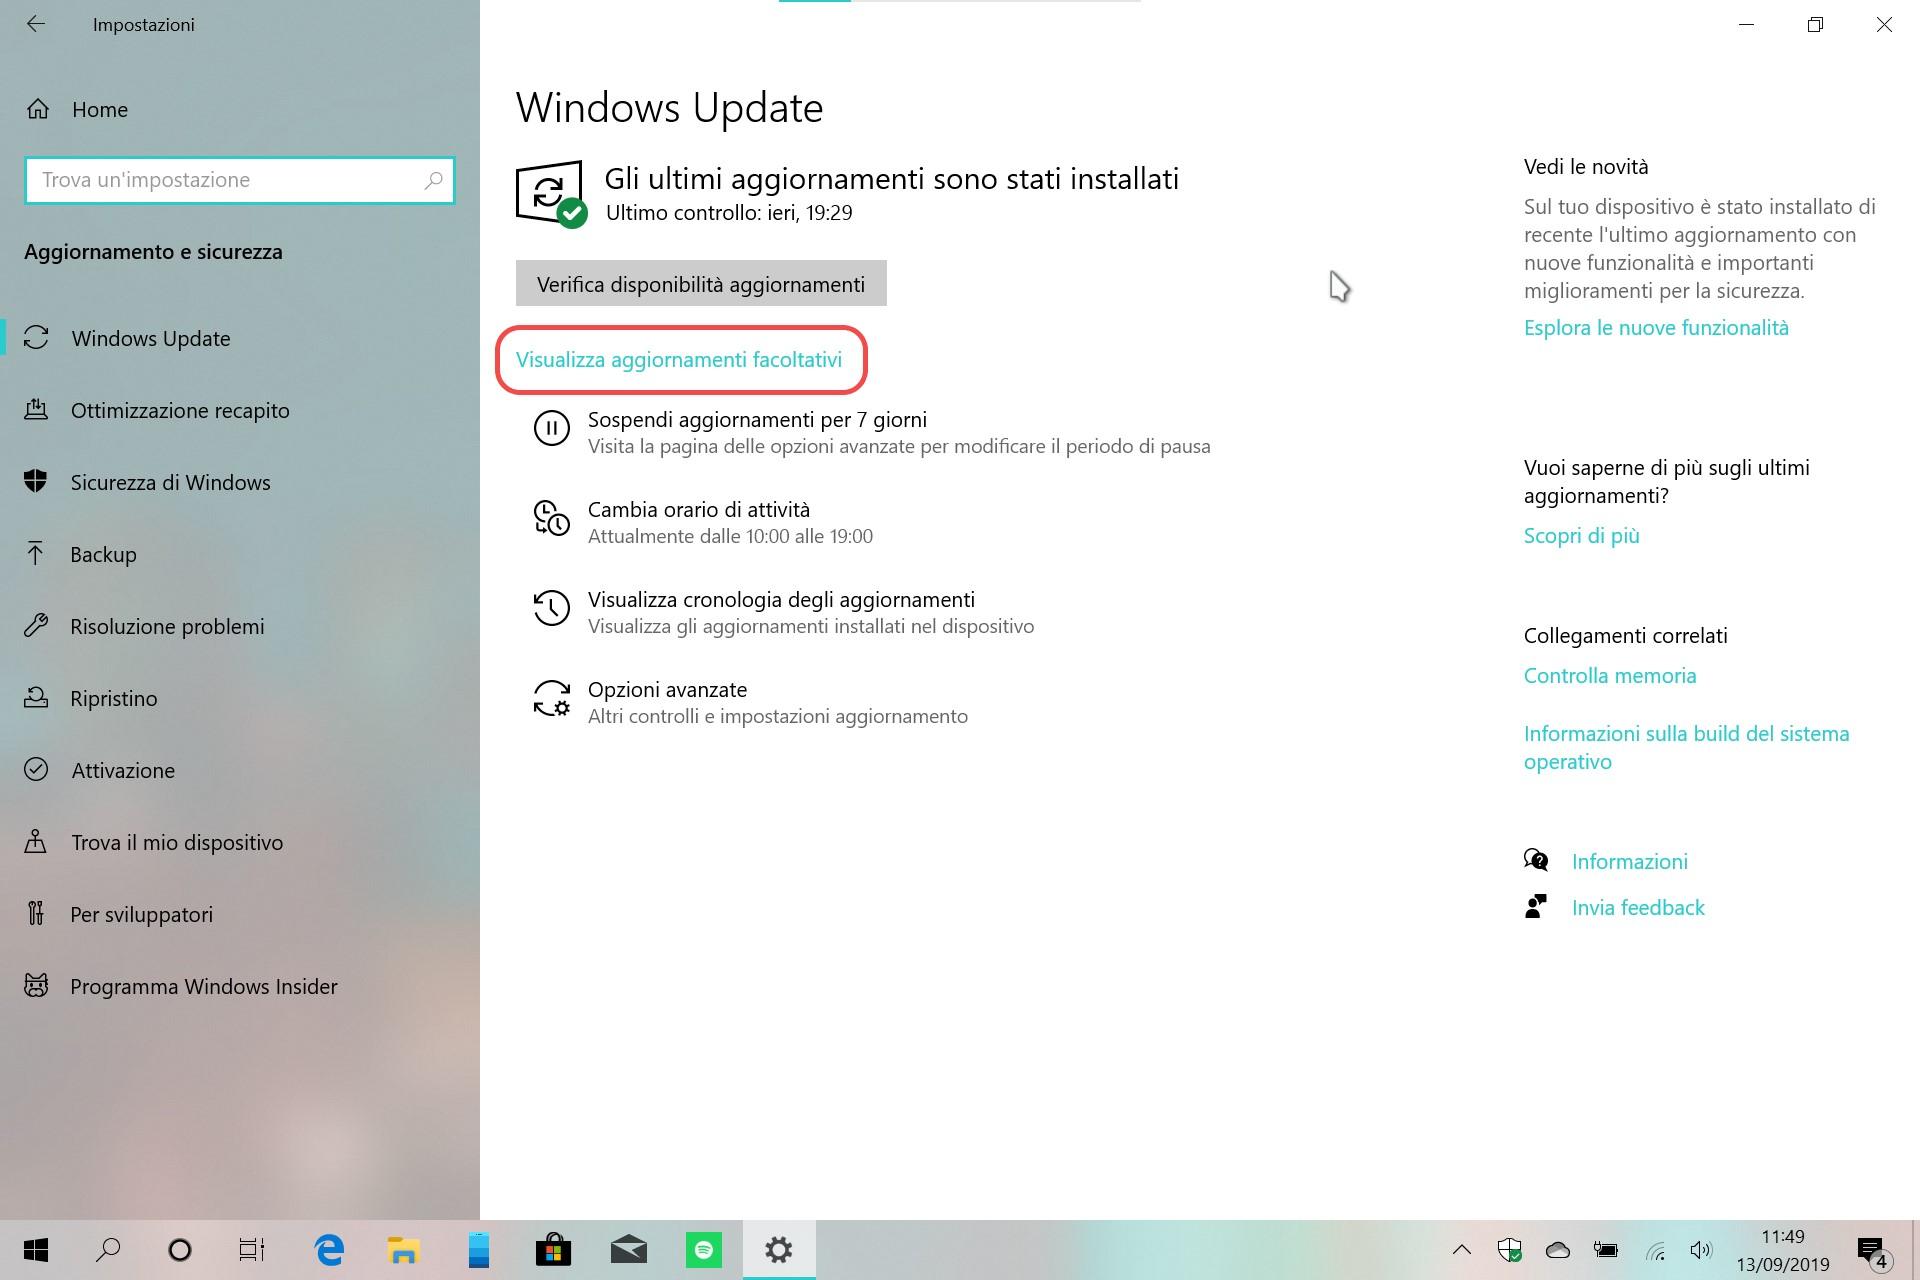 Windows 10 20H1 aggiornamenti facoltativi in Windows Update 1